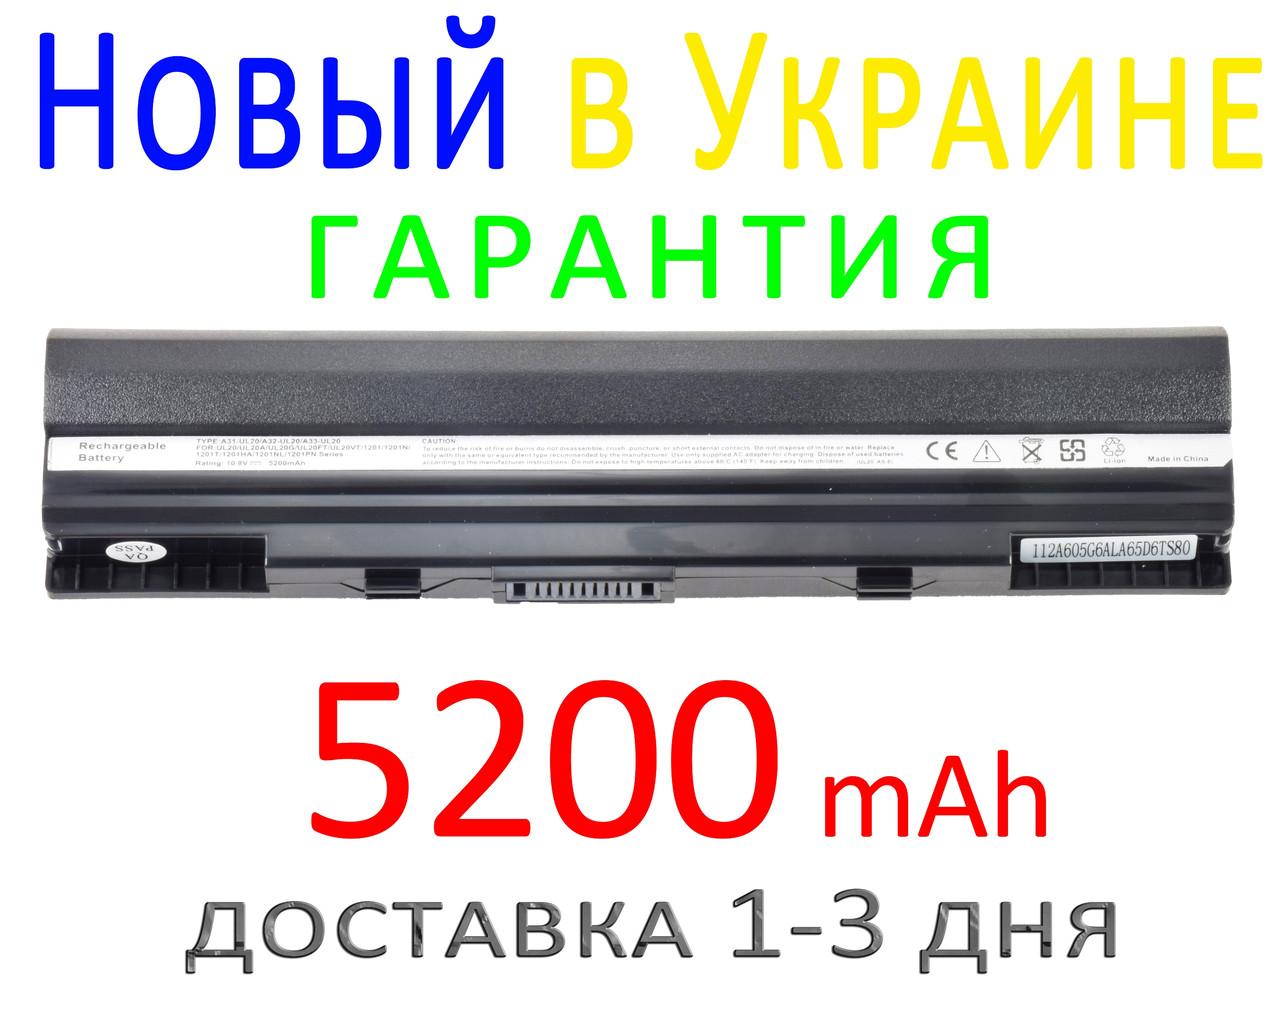 Аккумулятор батарея ASUS Eee PC 1201 HA K N NL PN T Pro23 Pro23A UL20